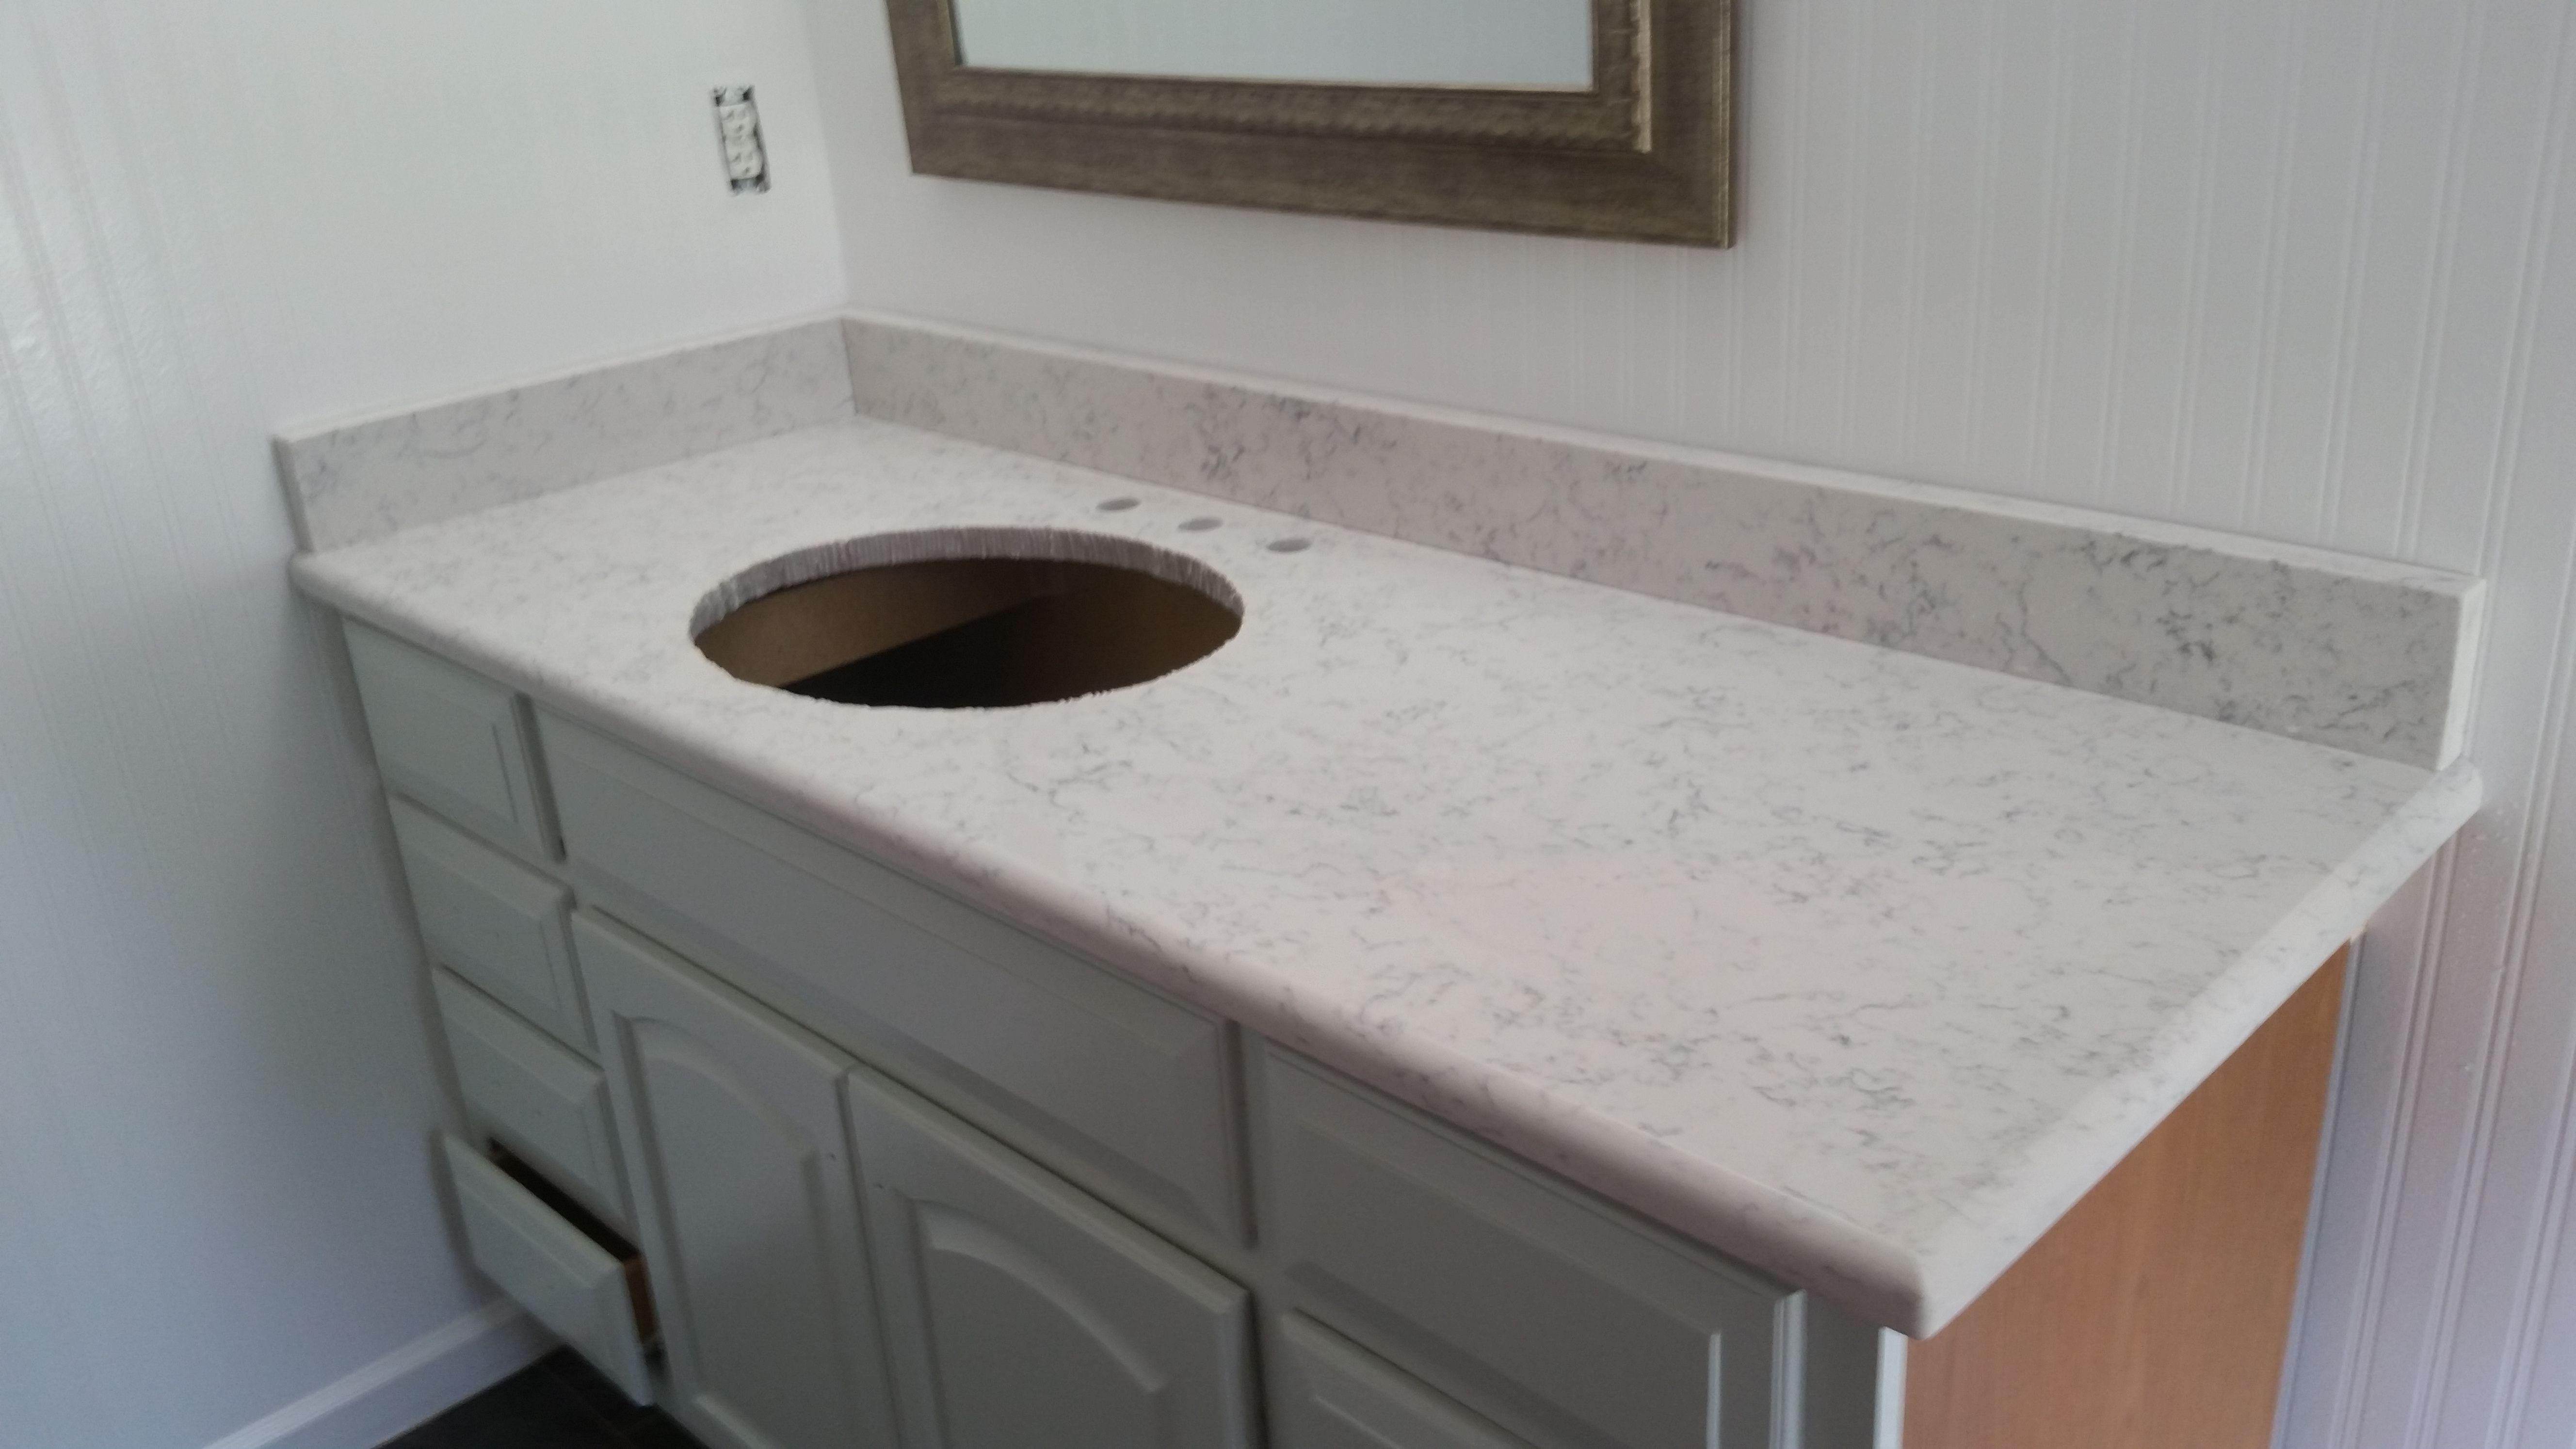 Lyra Silestone Quartz Granite Bathroom Vanity Install For The